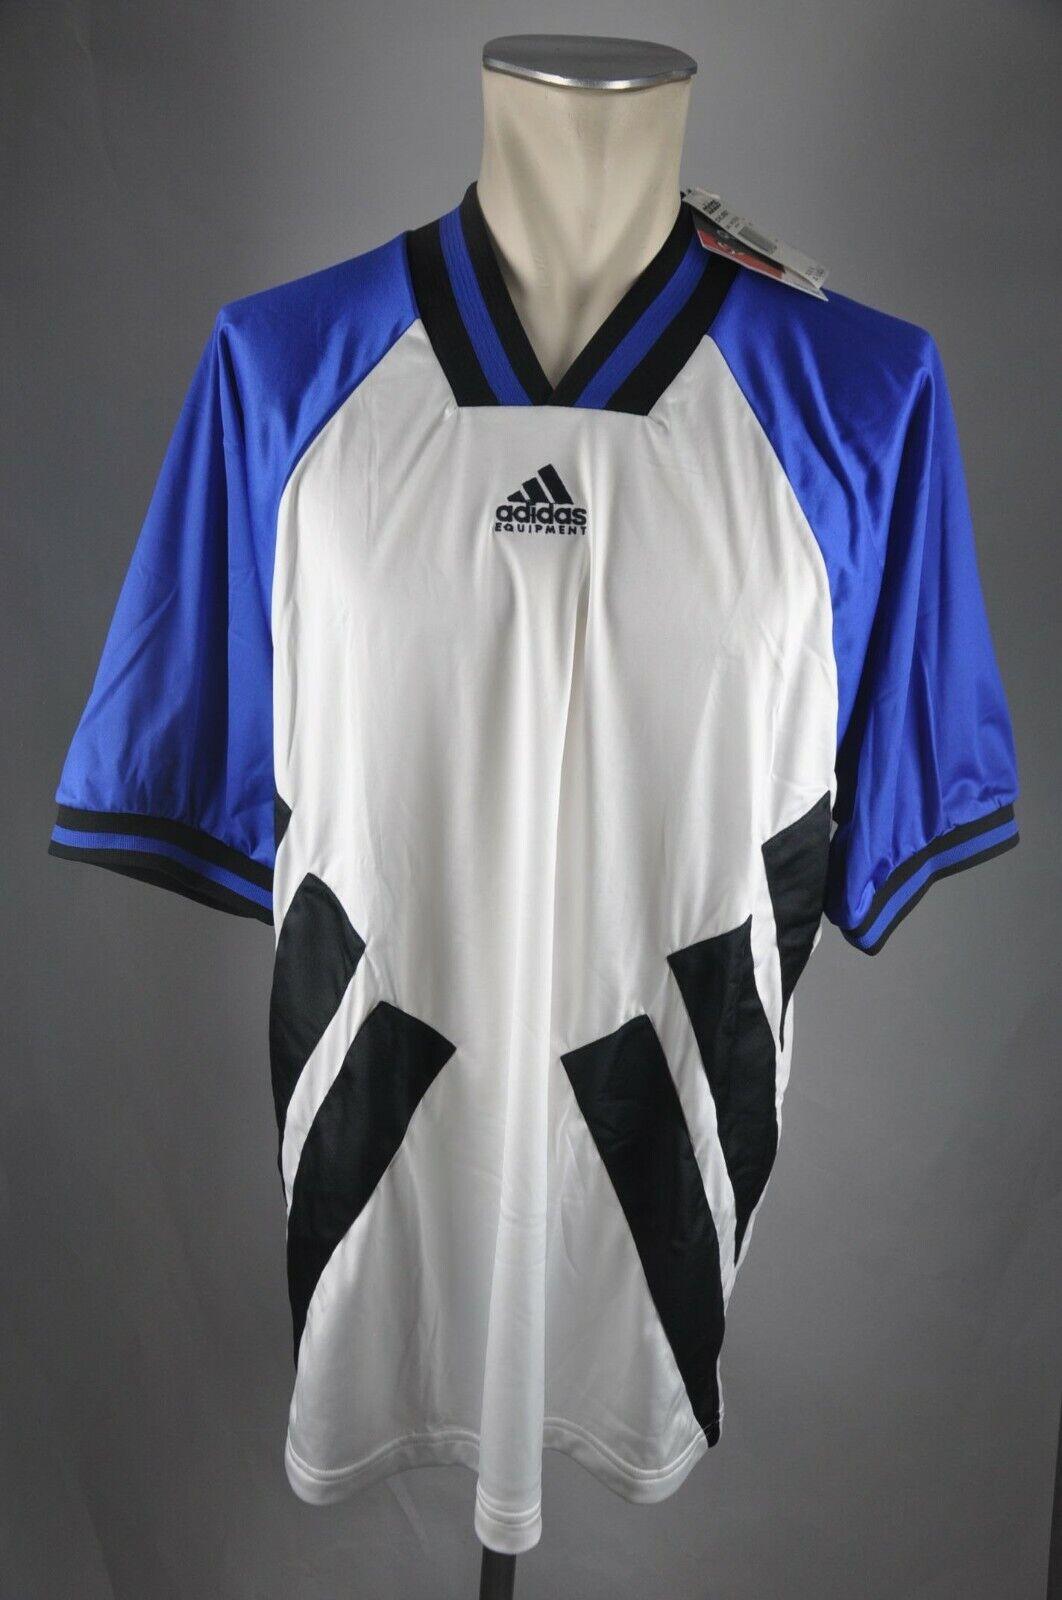 Adidas Equipment vintage Trikot 90er oldschool Shirt Gr. XL EQT- WC jersey VAD1